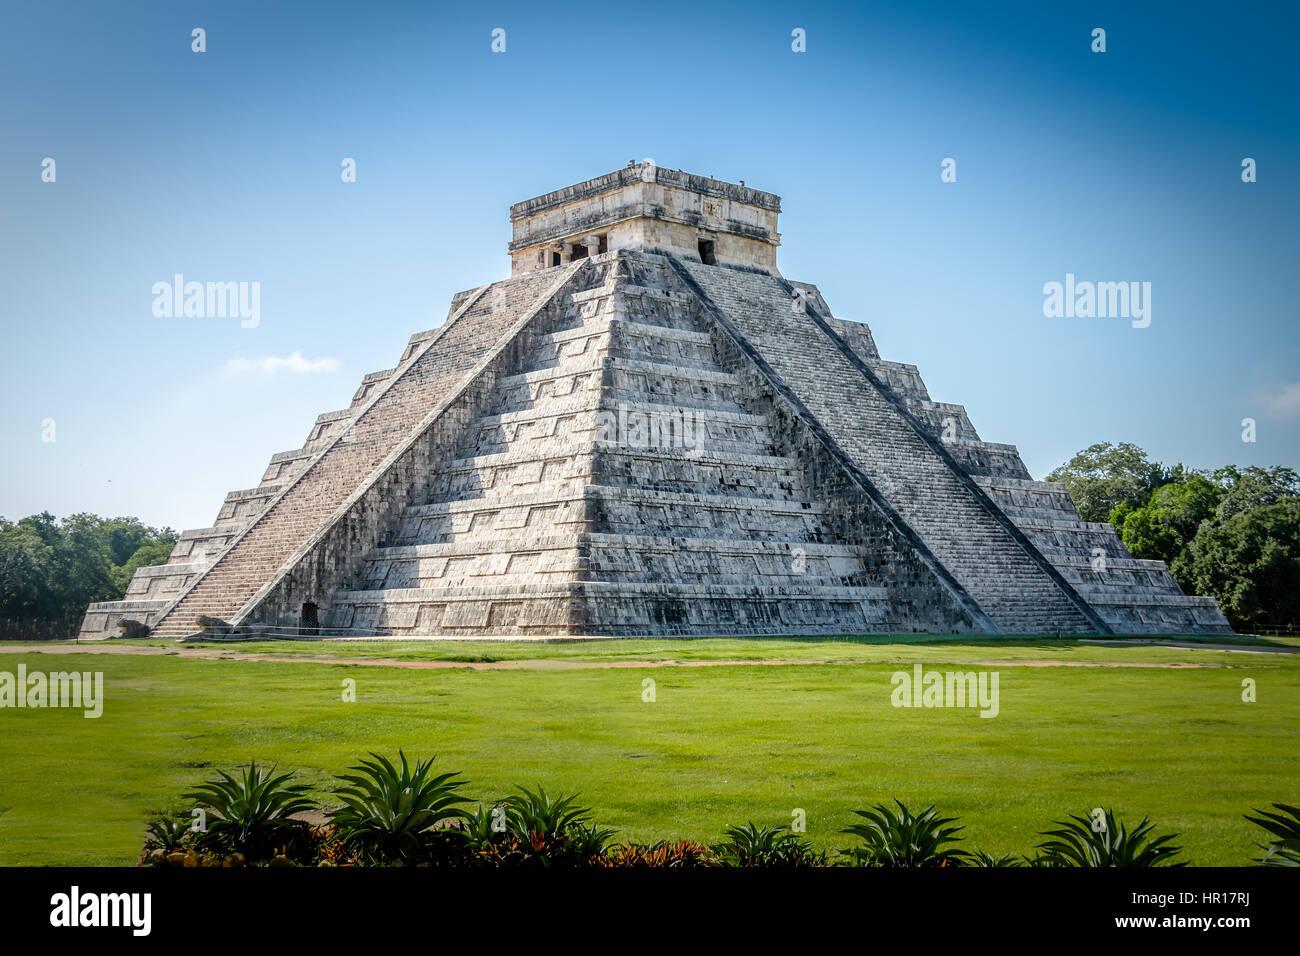 Temple maya pyramide de Kukulkan - Chichen Itza, Yucatan, Mexique Photo Stock